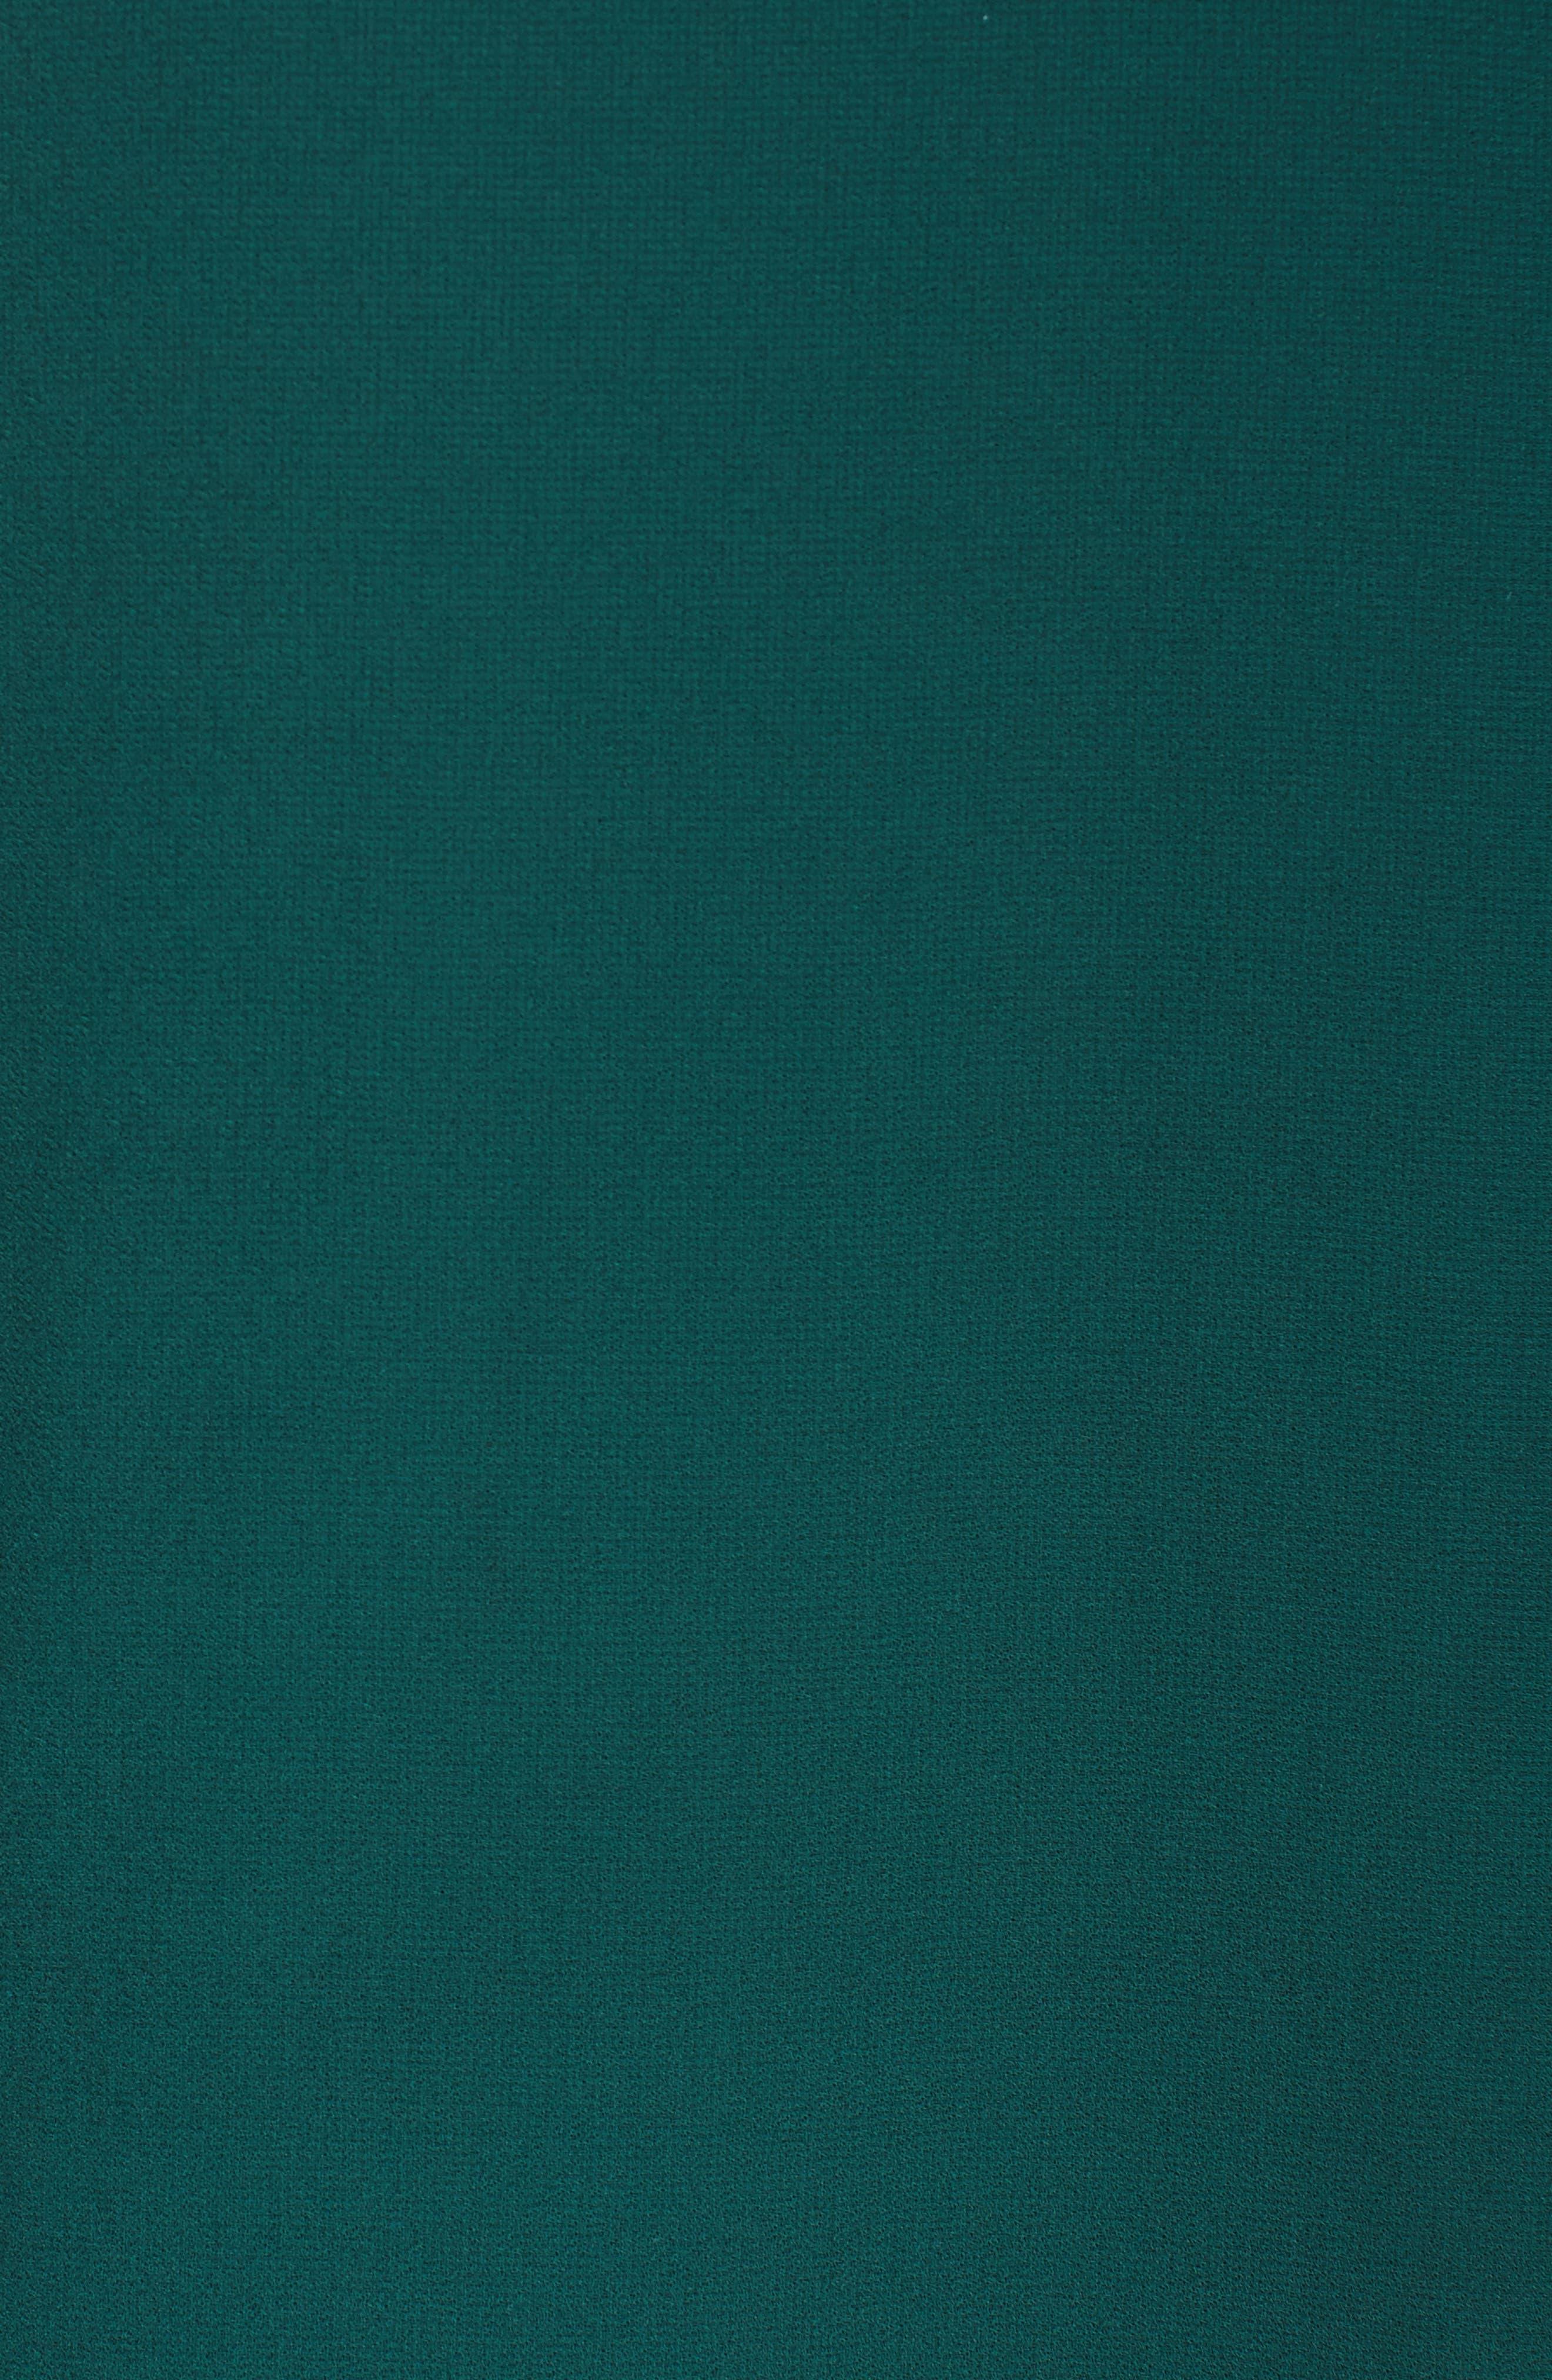 Embellished Chiffon Shift Dress,                             Alternate thumbnail 5, color,                             302